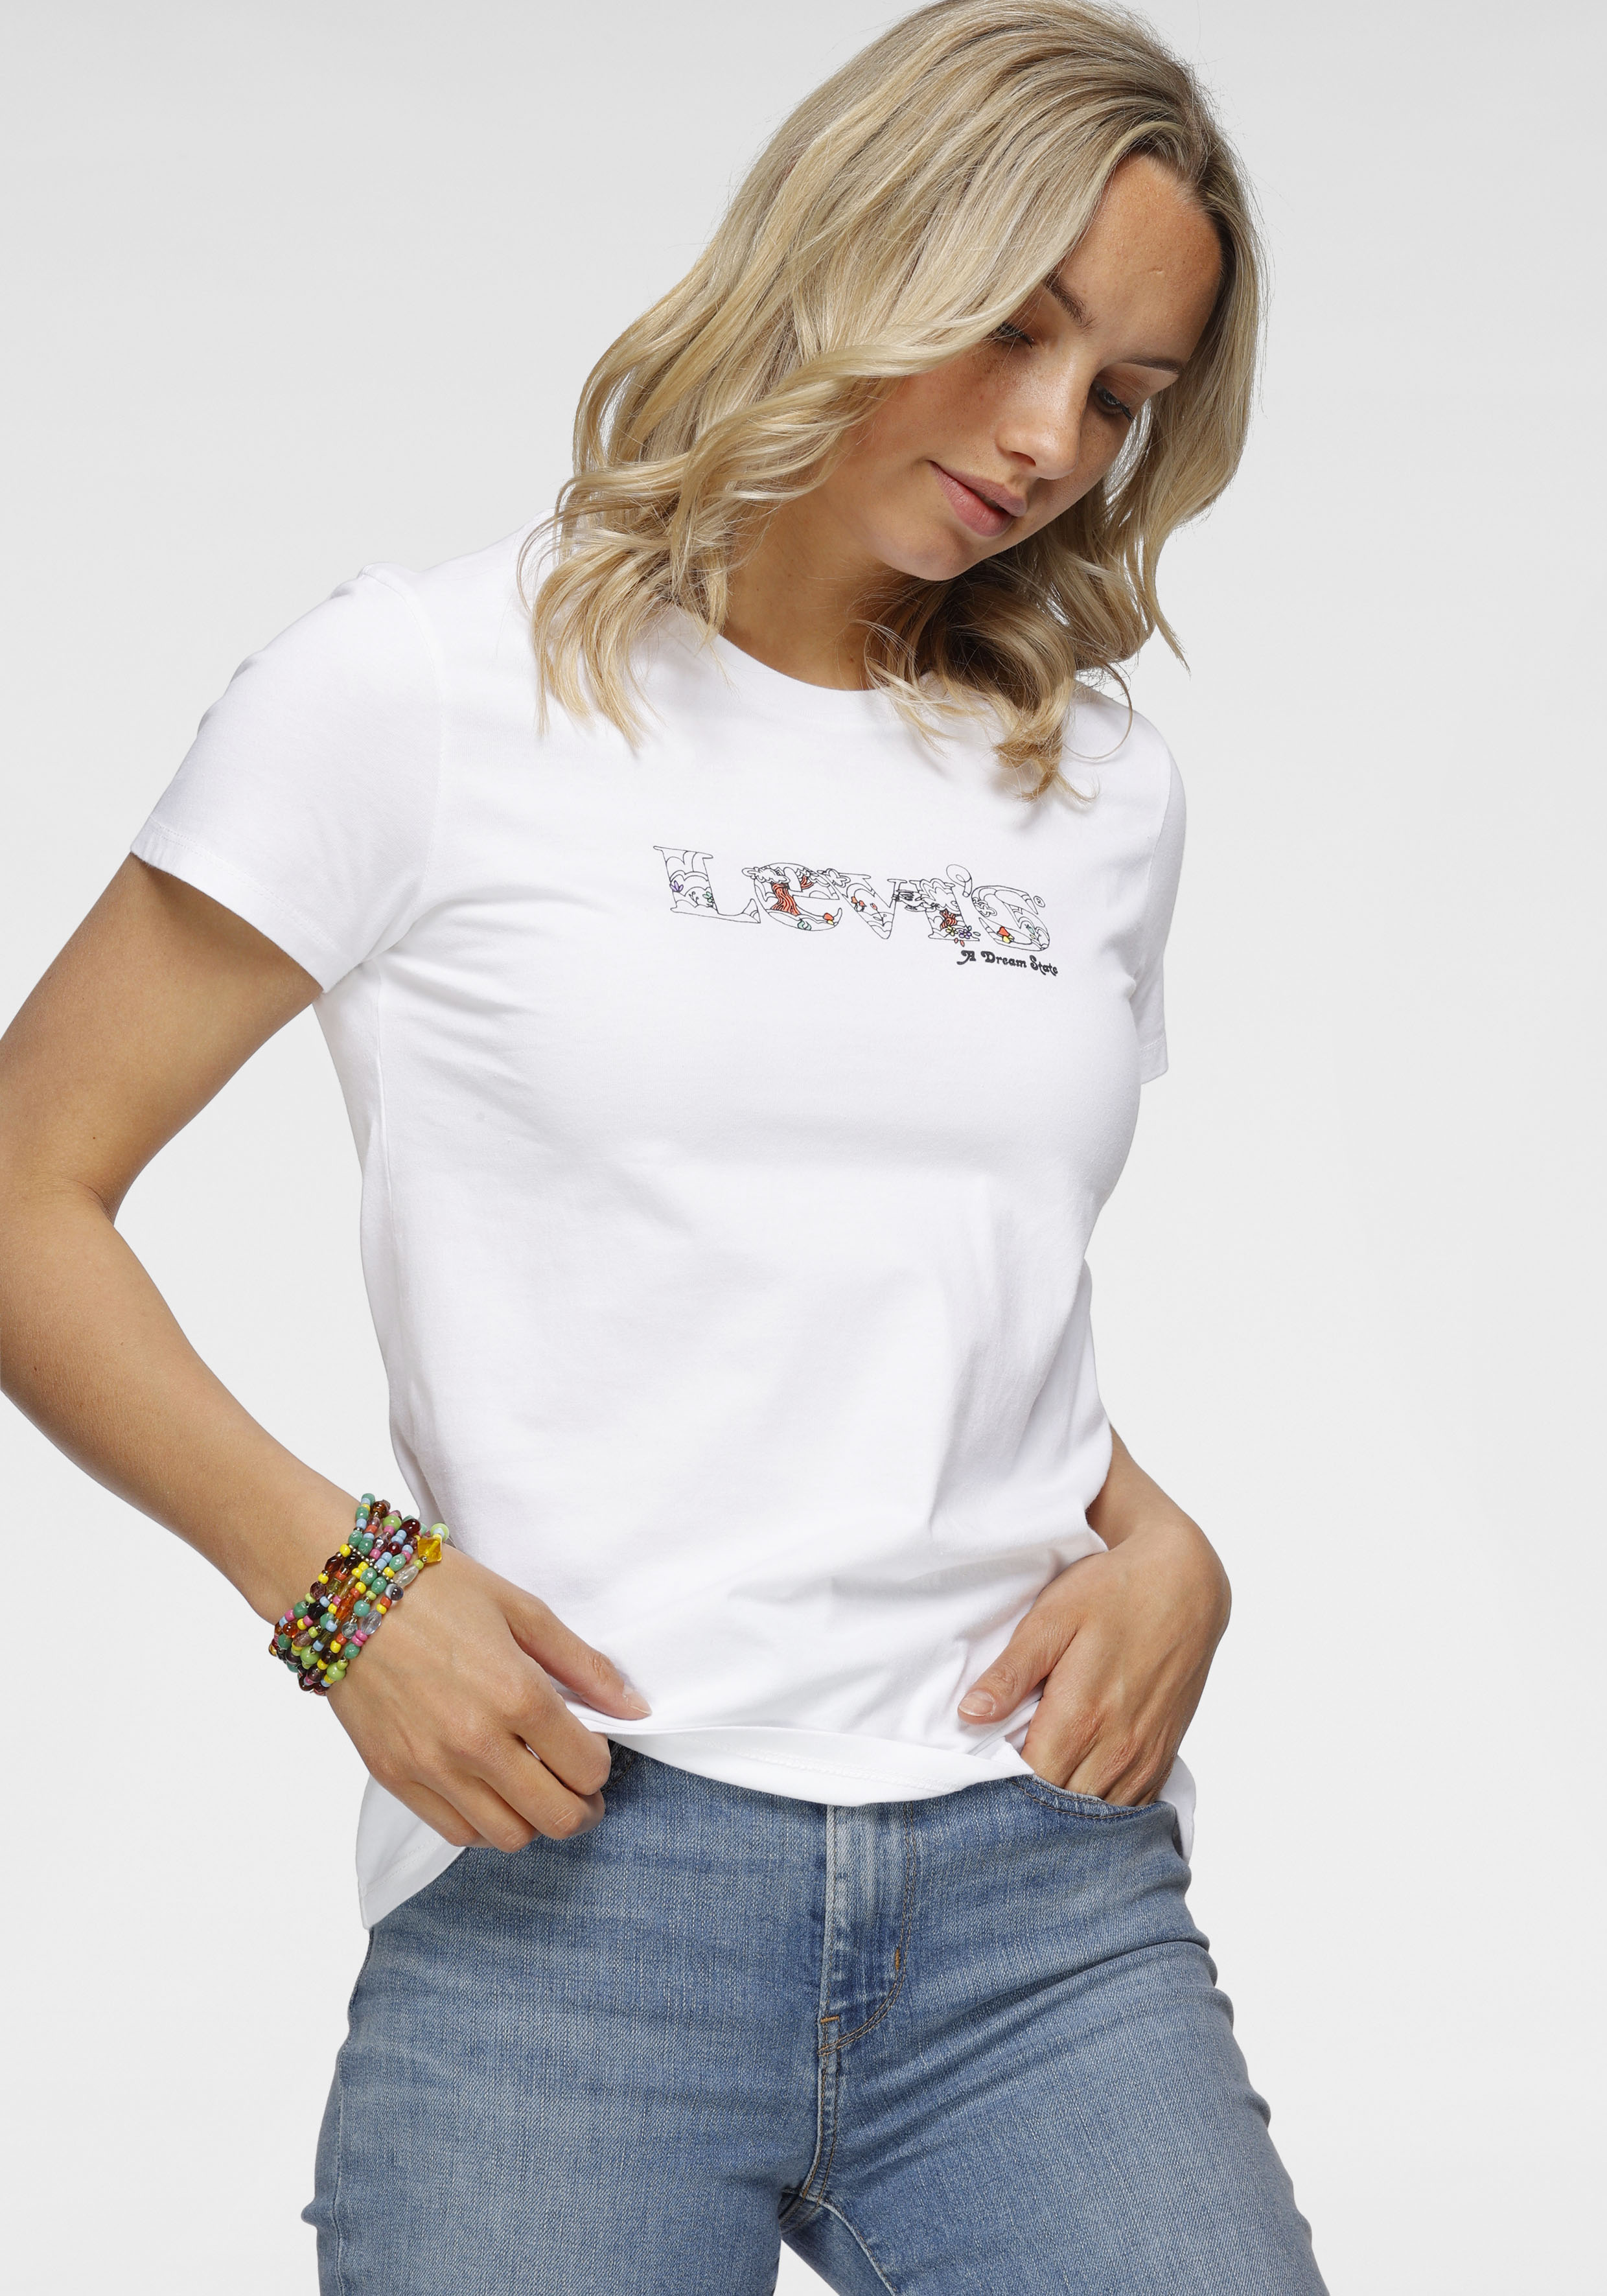 levis - Levi's T-Shirt The Perfect Tee Pride Edition, mit floralem Markenschriftzug